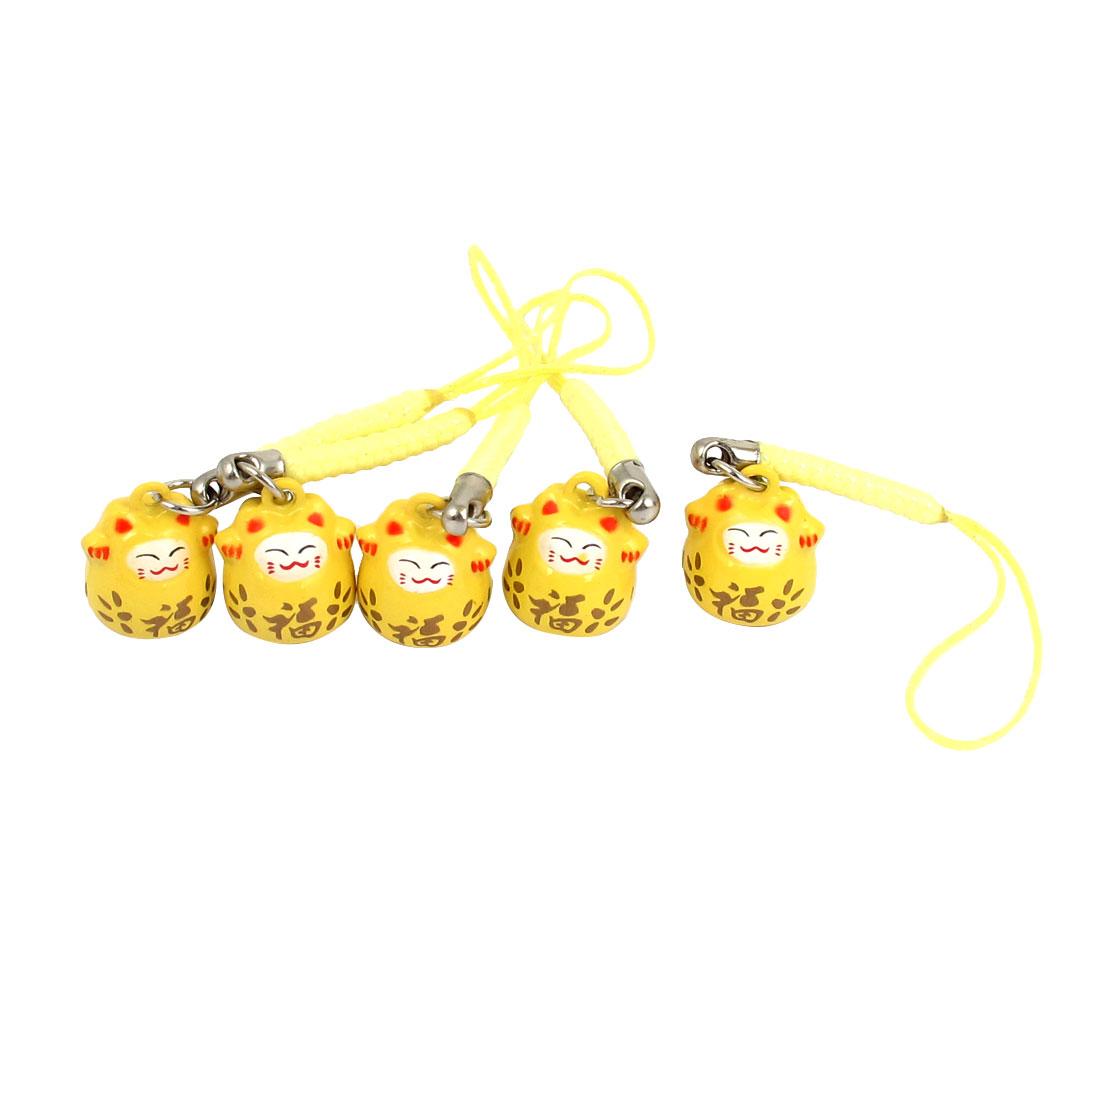 Maneki Neko Cat Japanese Lucky Charm Ring Bell Hanging Strap Yellow 5 Pcs